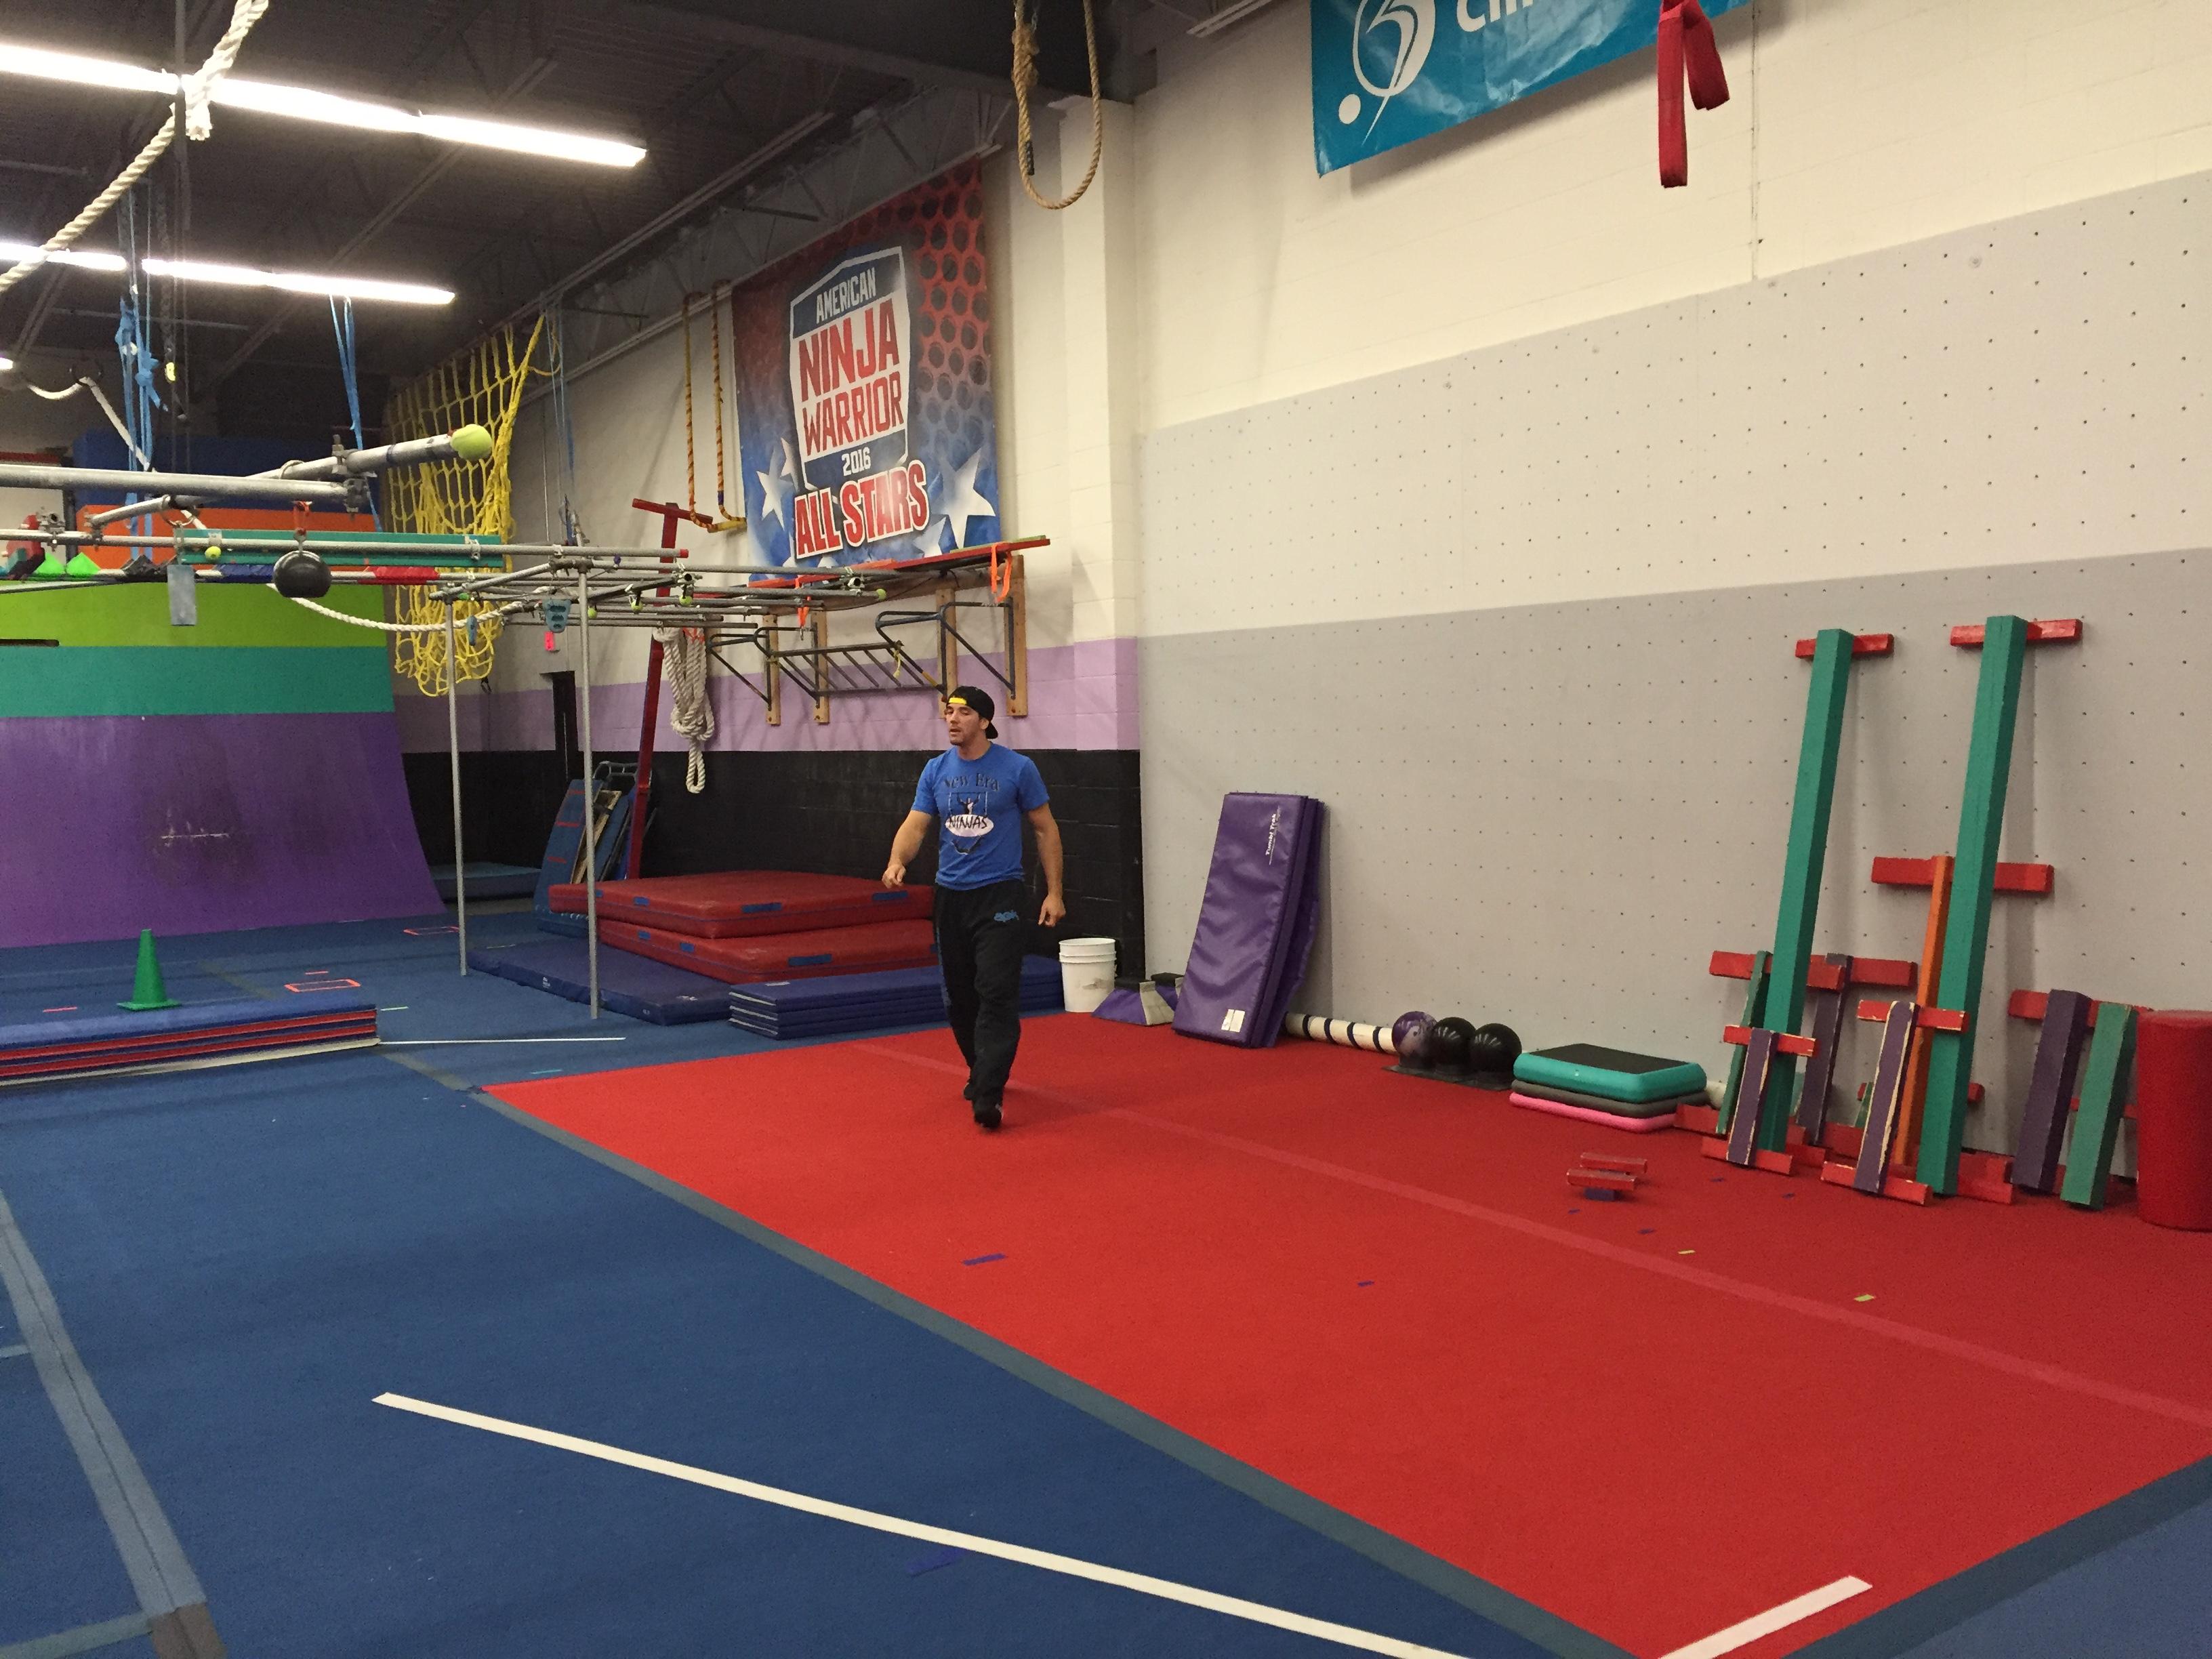 Little Ninjas are learning straight from American Ninja Warrior Drew  Drechsel at New Era Ninja 5aadae69323